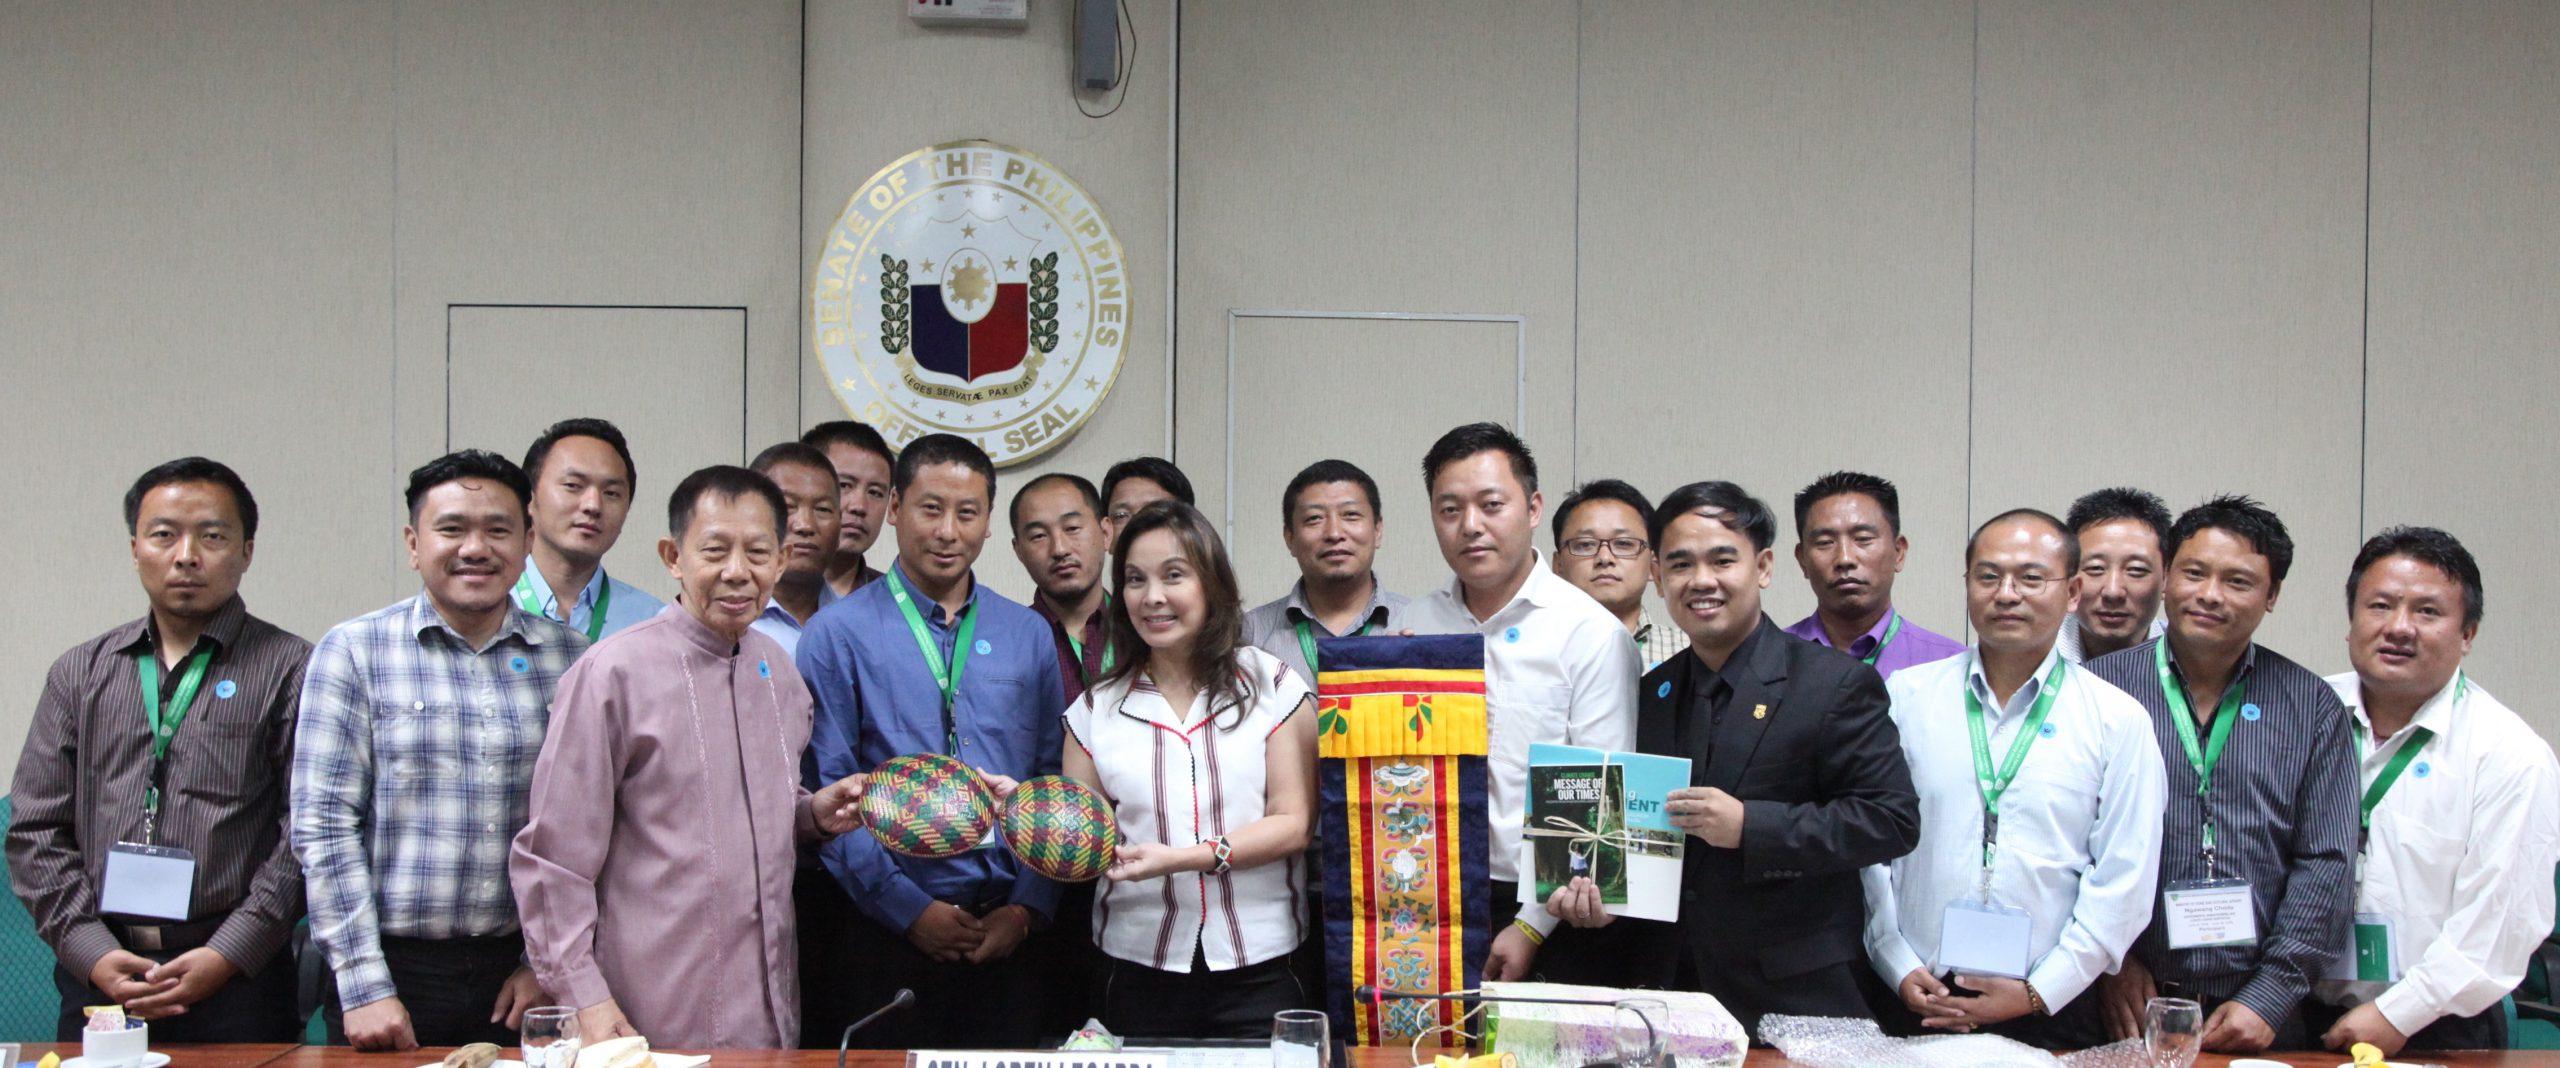 Senator Legarda with Bhutanese Officials